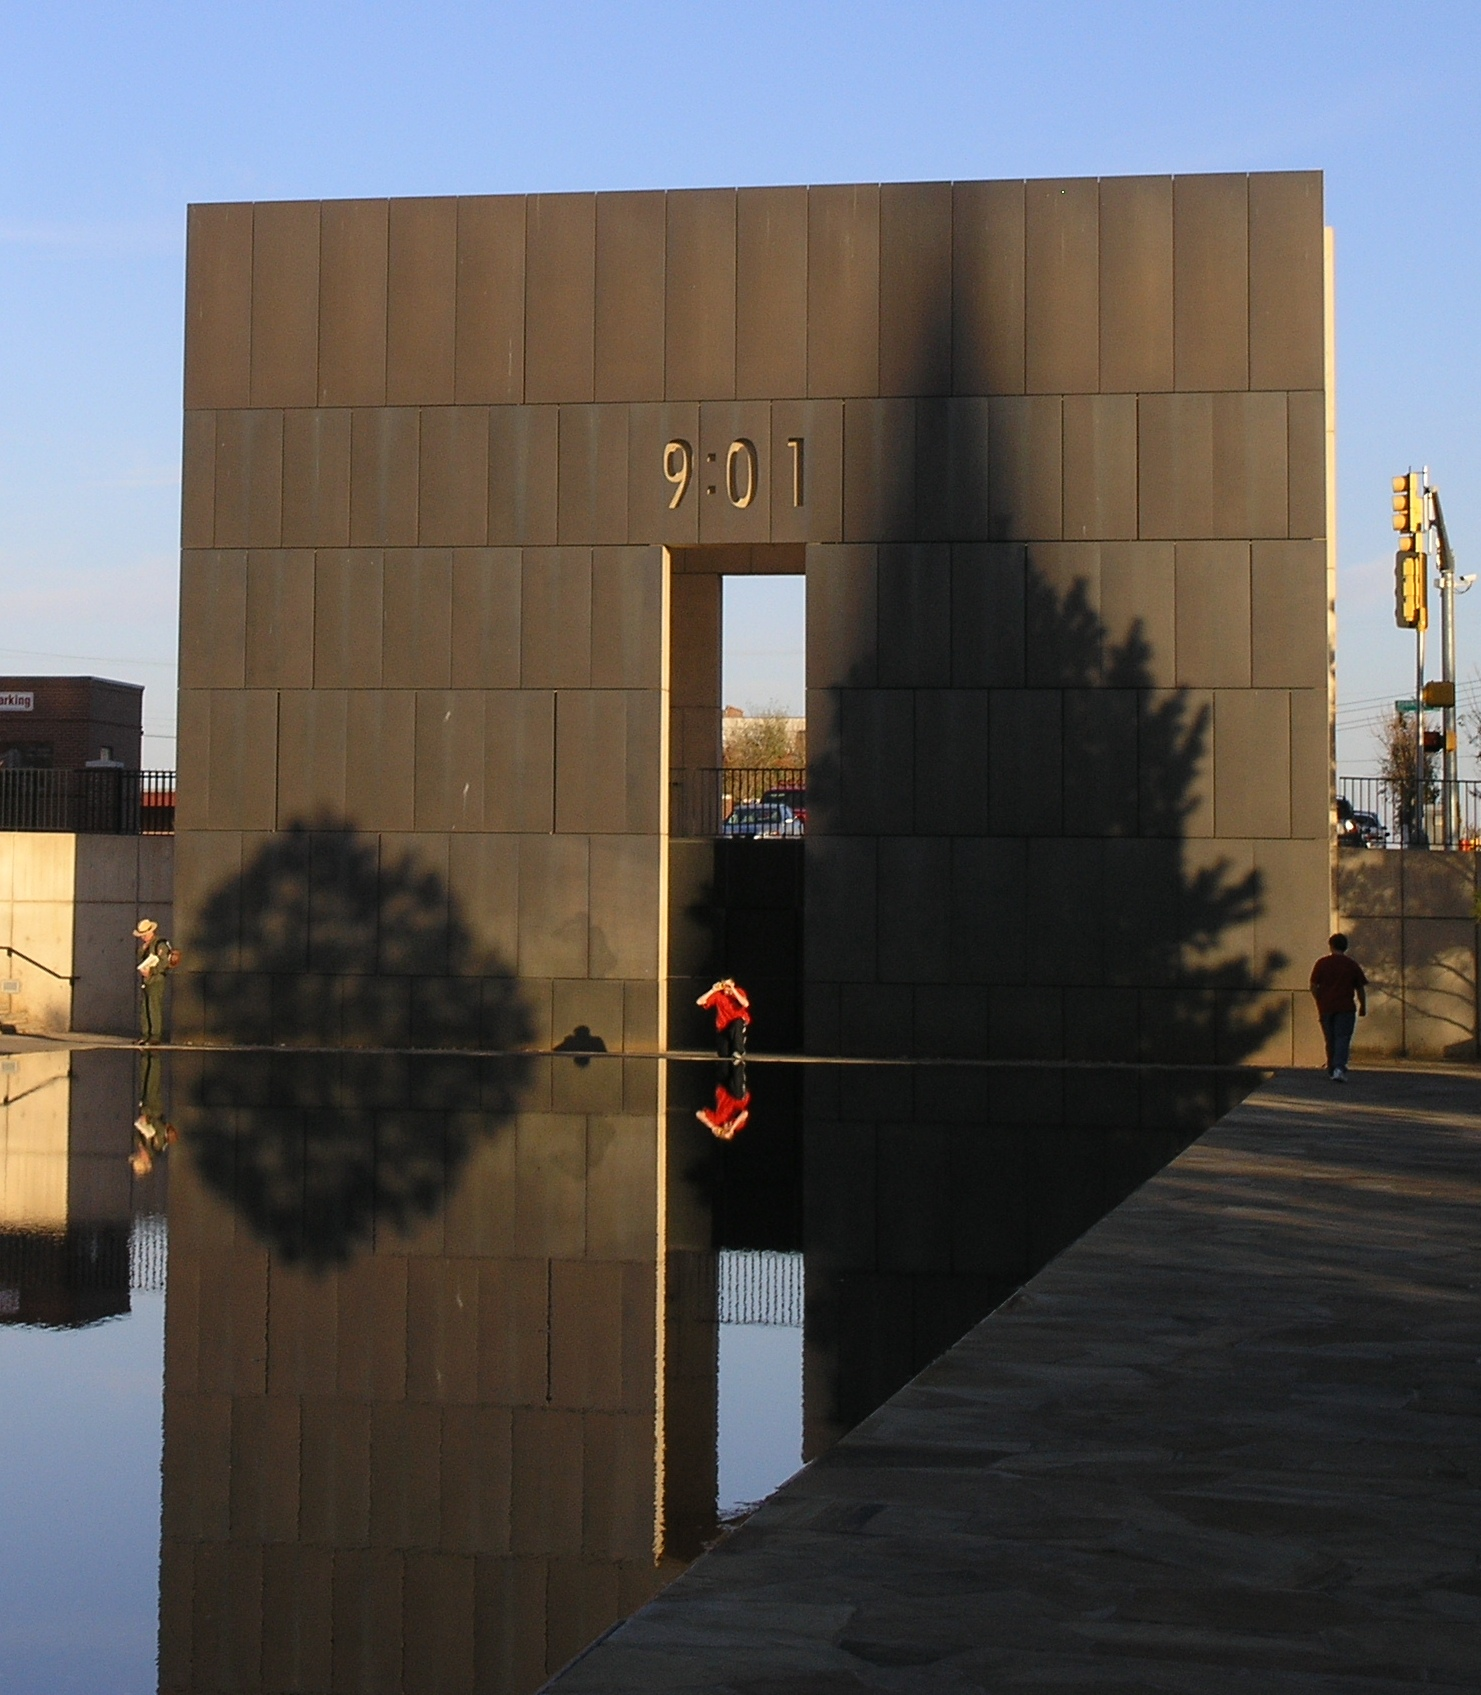 Oklahoma city bombing date